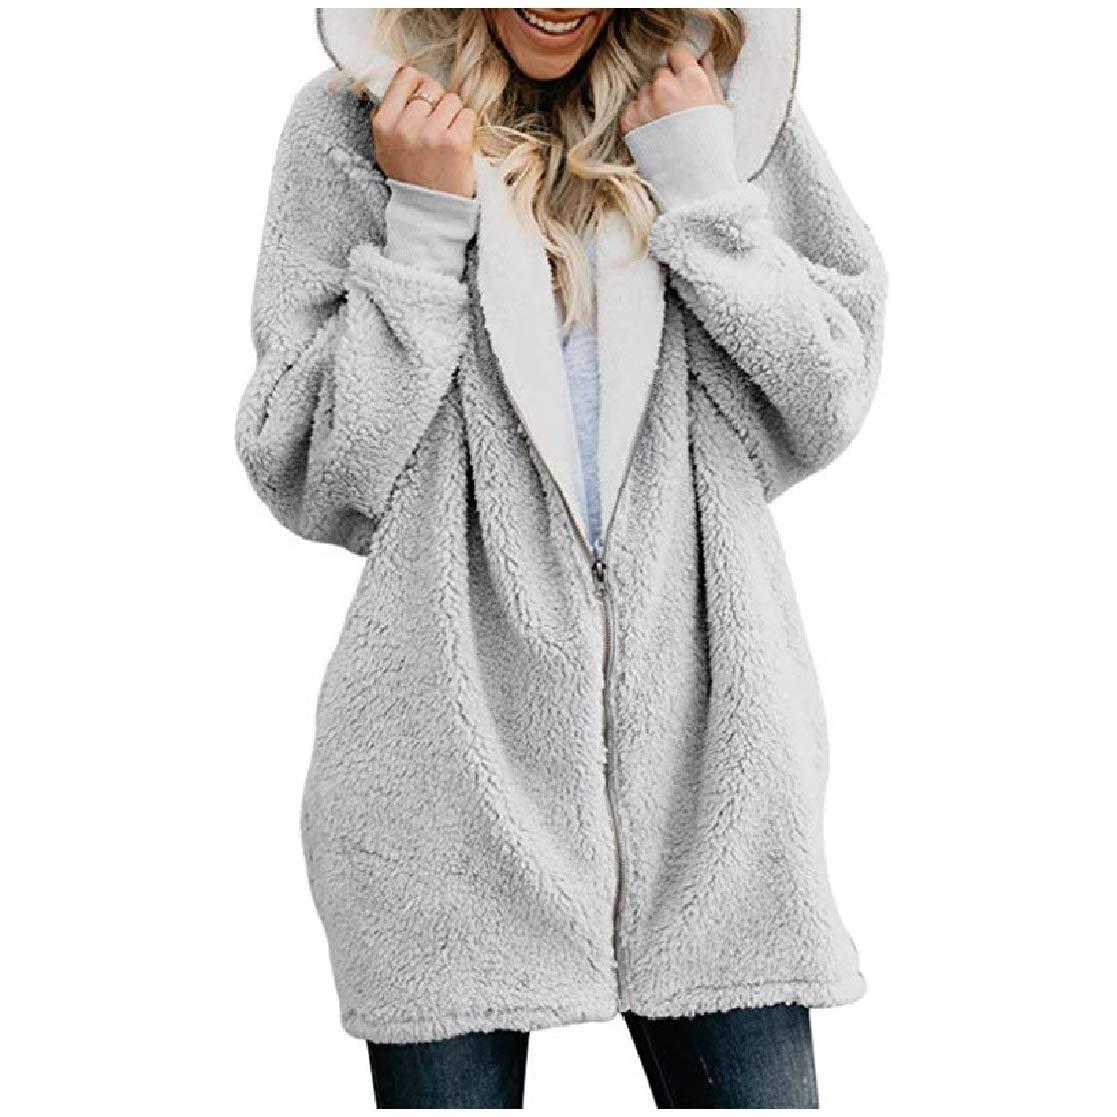 YUNY Womens Warm Zip Velvet Mid Long Hoodie Long-Sleeve Coat Jacket Grey S